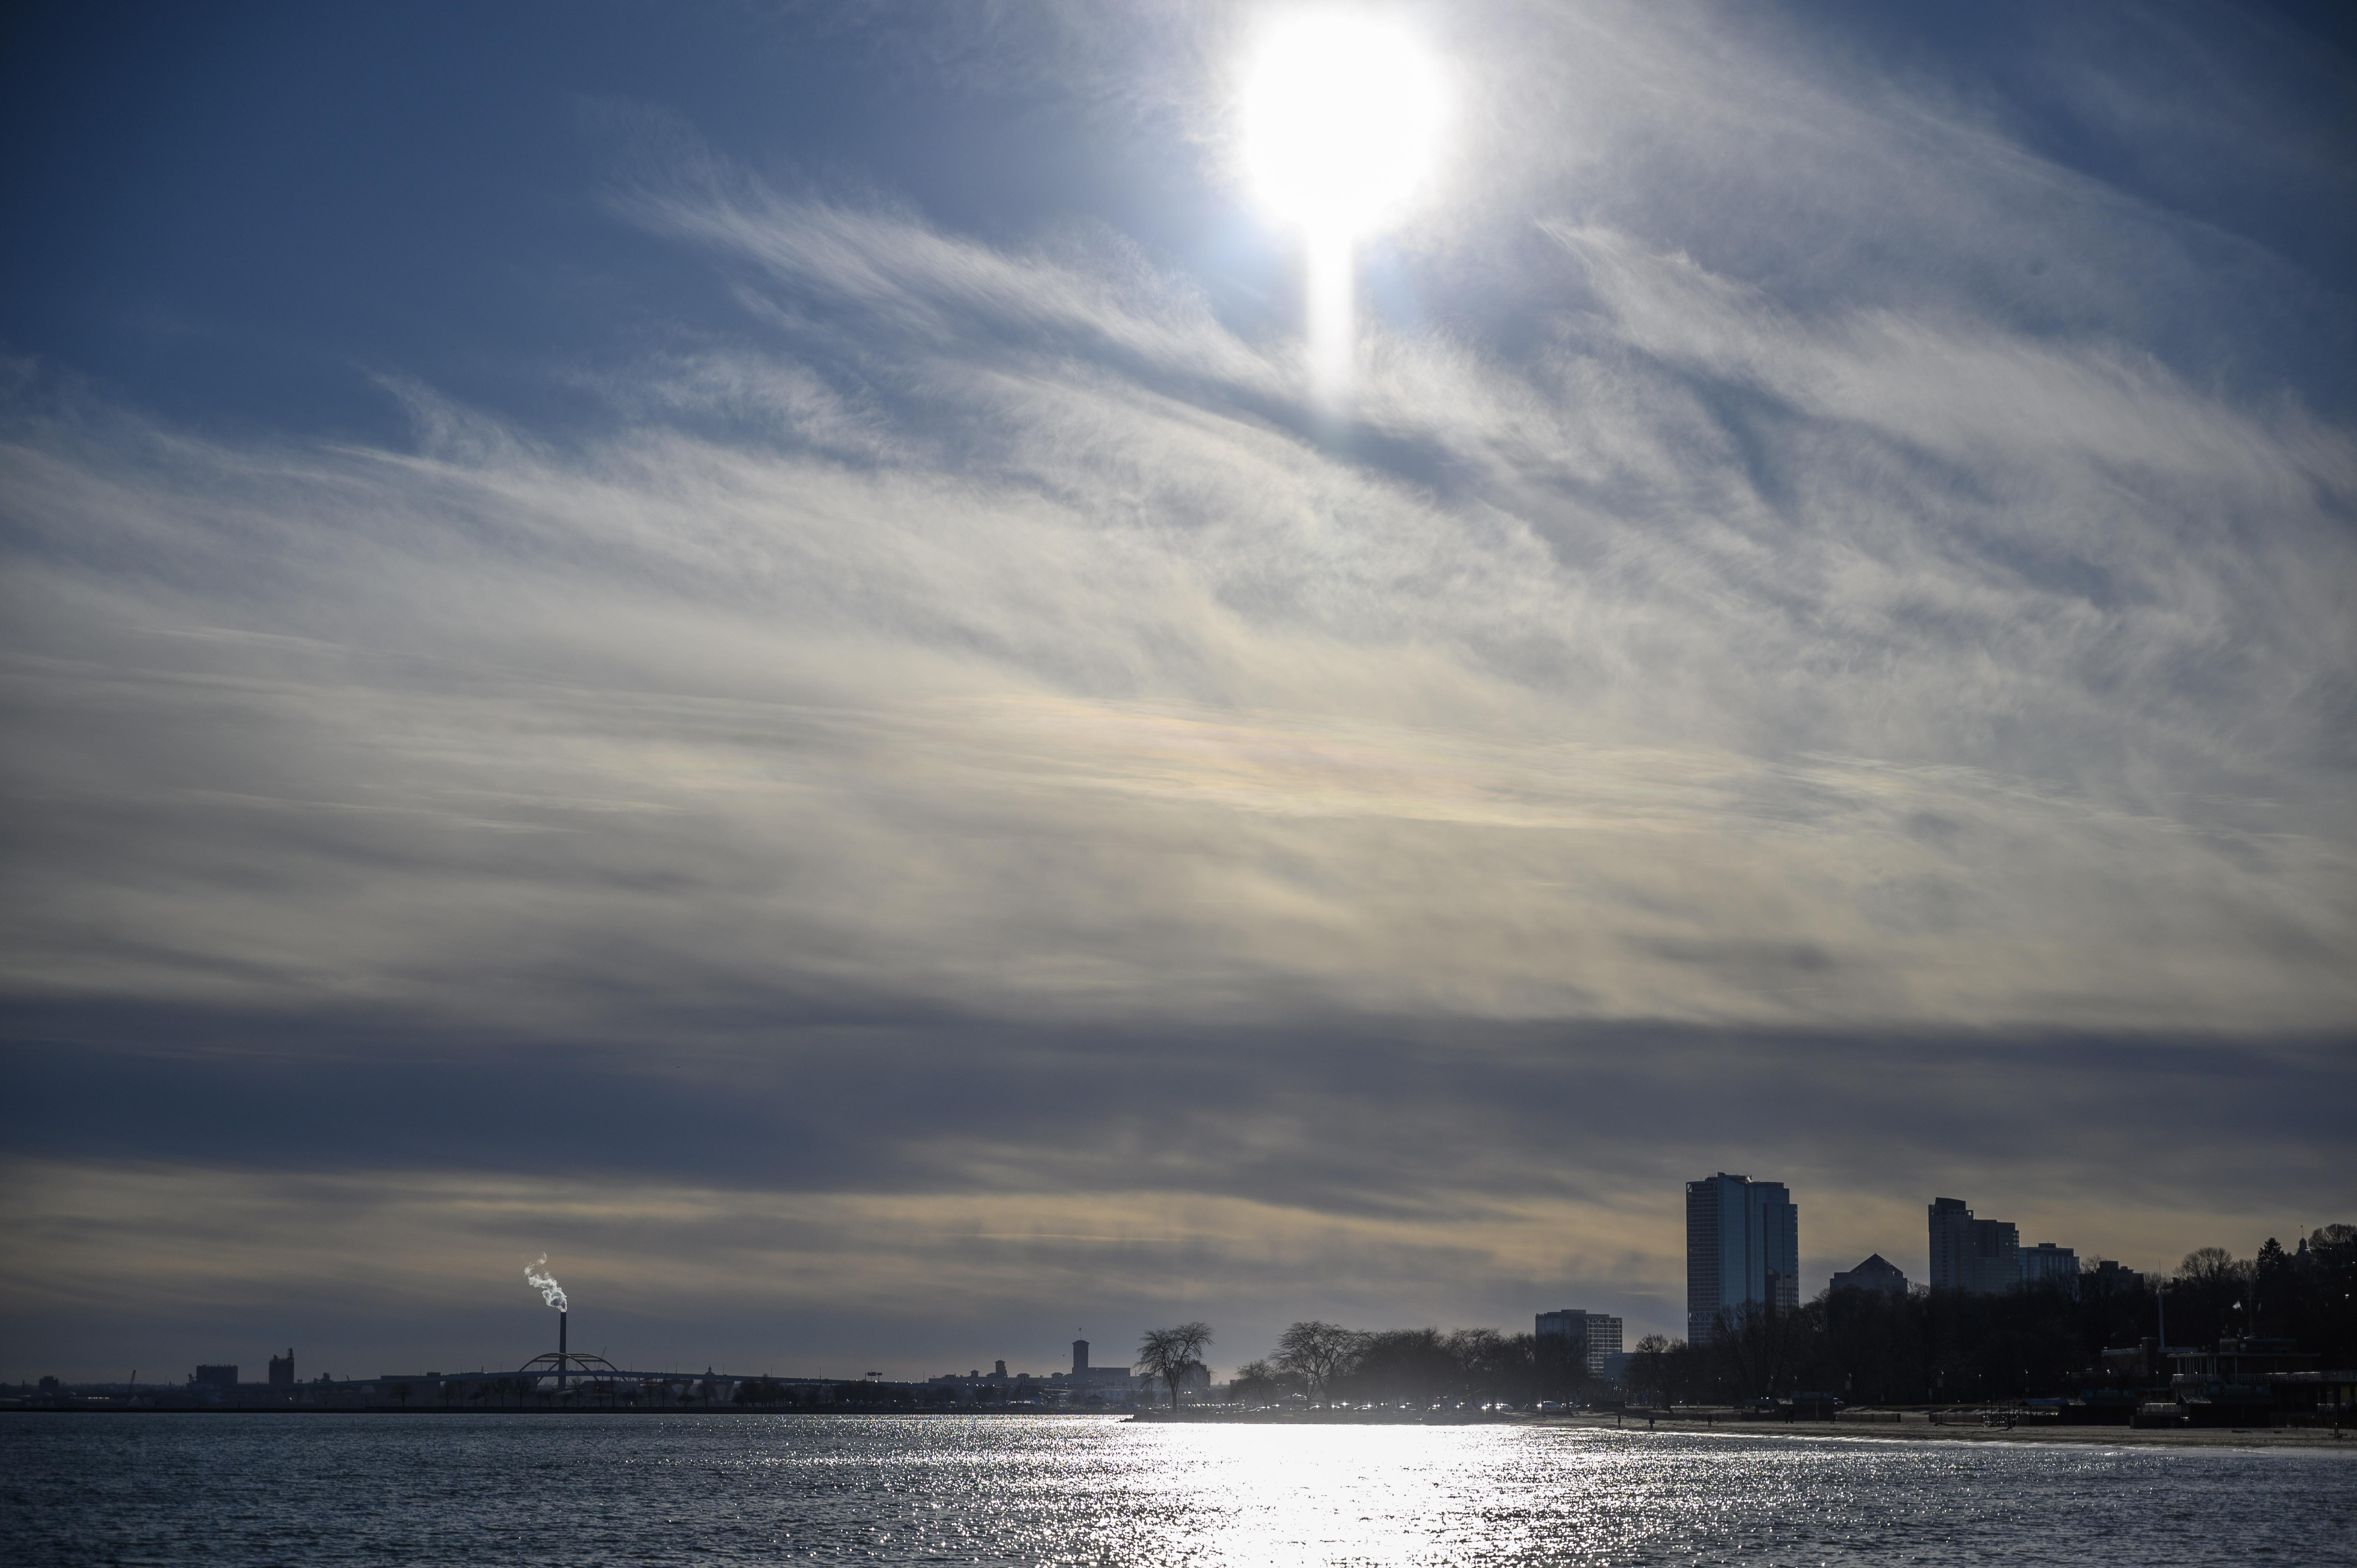 US-CITY SCAPE-MILWAUKEE-LAKE MICHIGAN